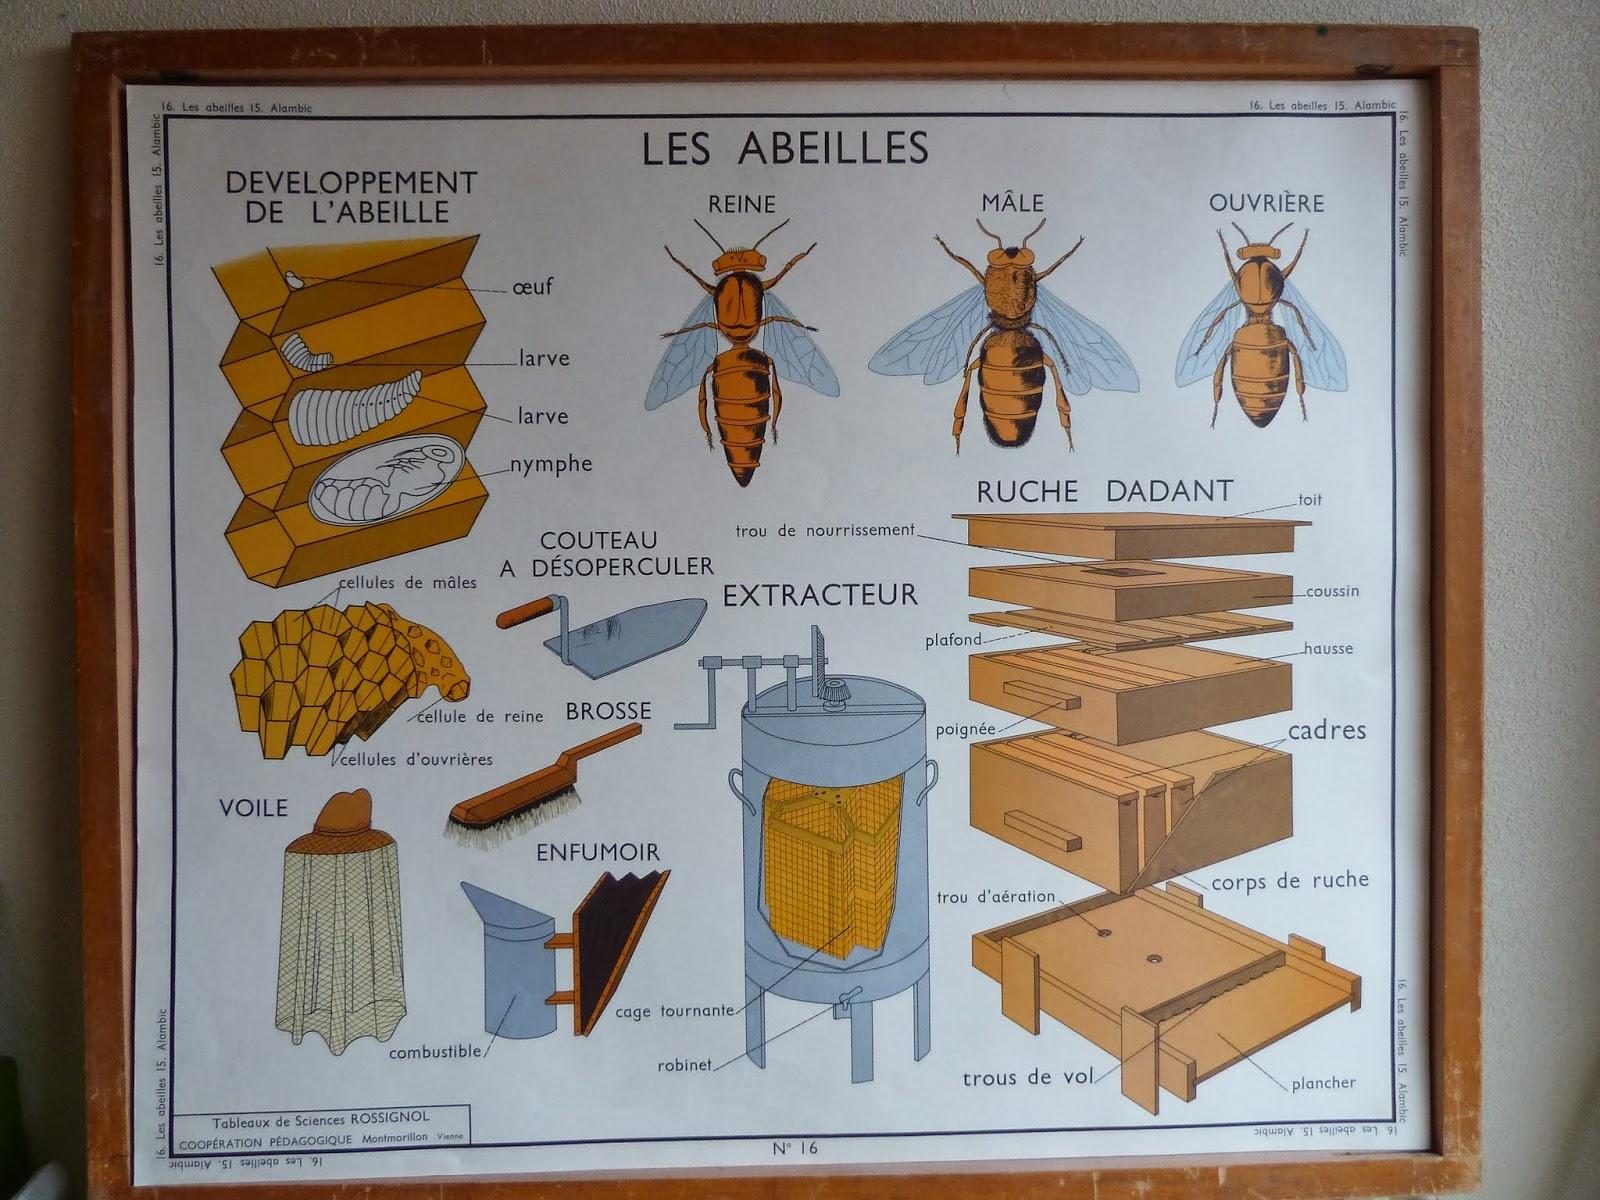 ecole fmr 1000 affiches scolaires serie la ferme affiches scolaires rossignol1960. Black Bedroom Furniture Sets. Home Design Ideas